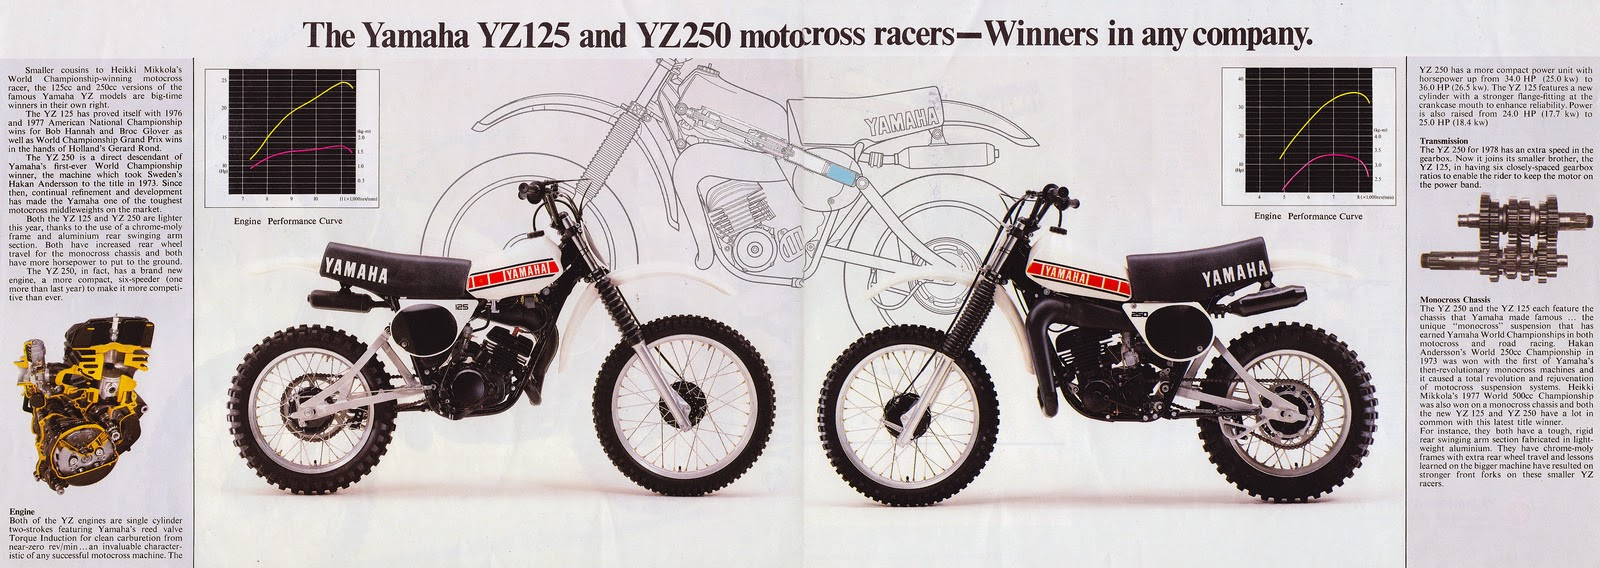 hight resolution of racing caf vintage brochures yamaha yz 125 250 1978 wiring diagram also yz 125 clutch on 89 in addition suzuki gsx r 750